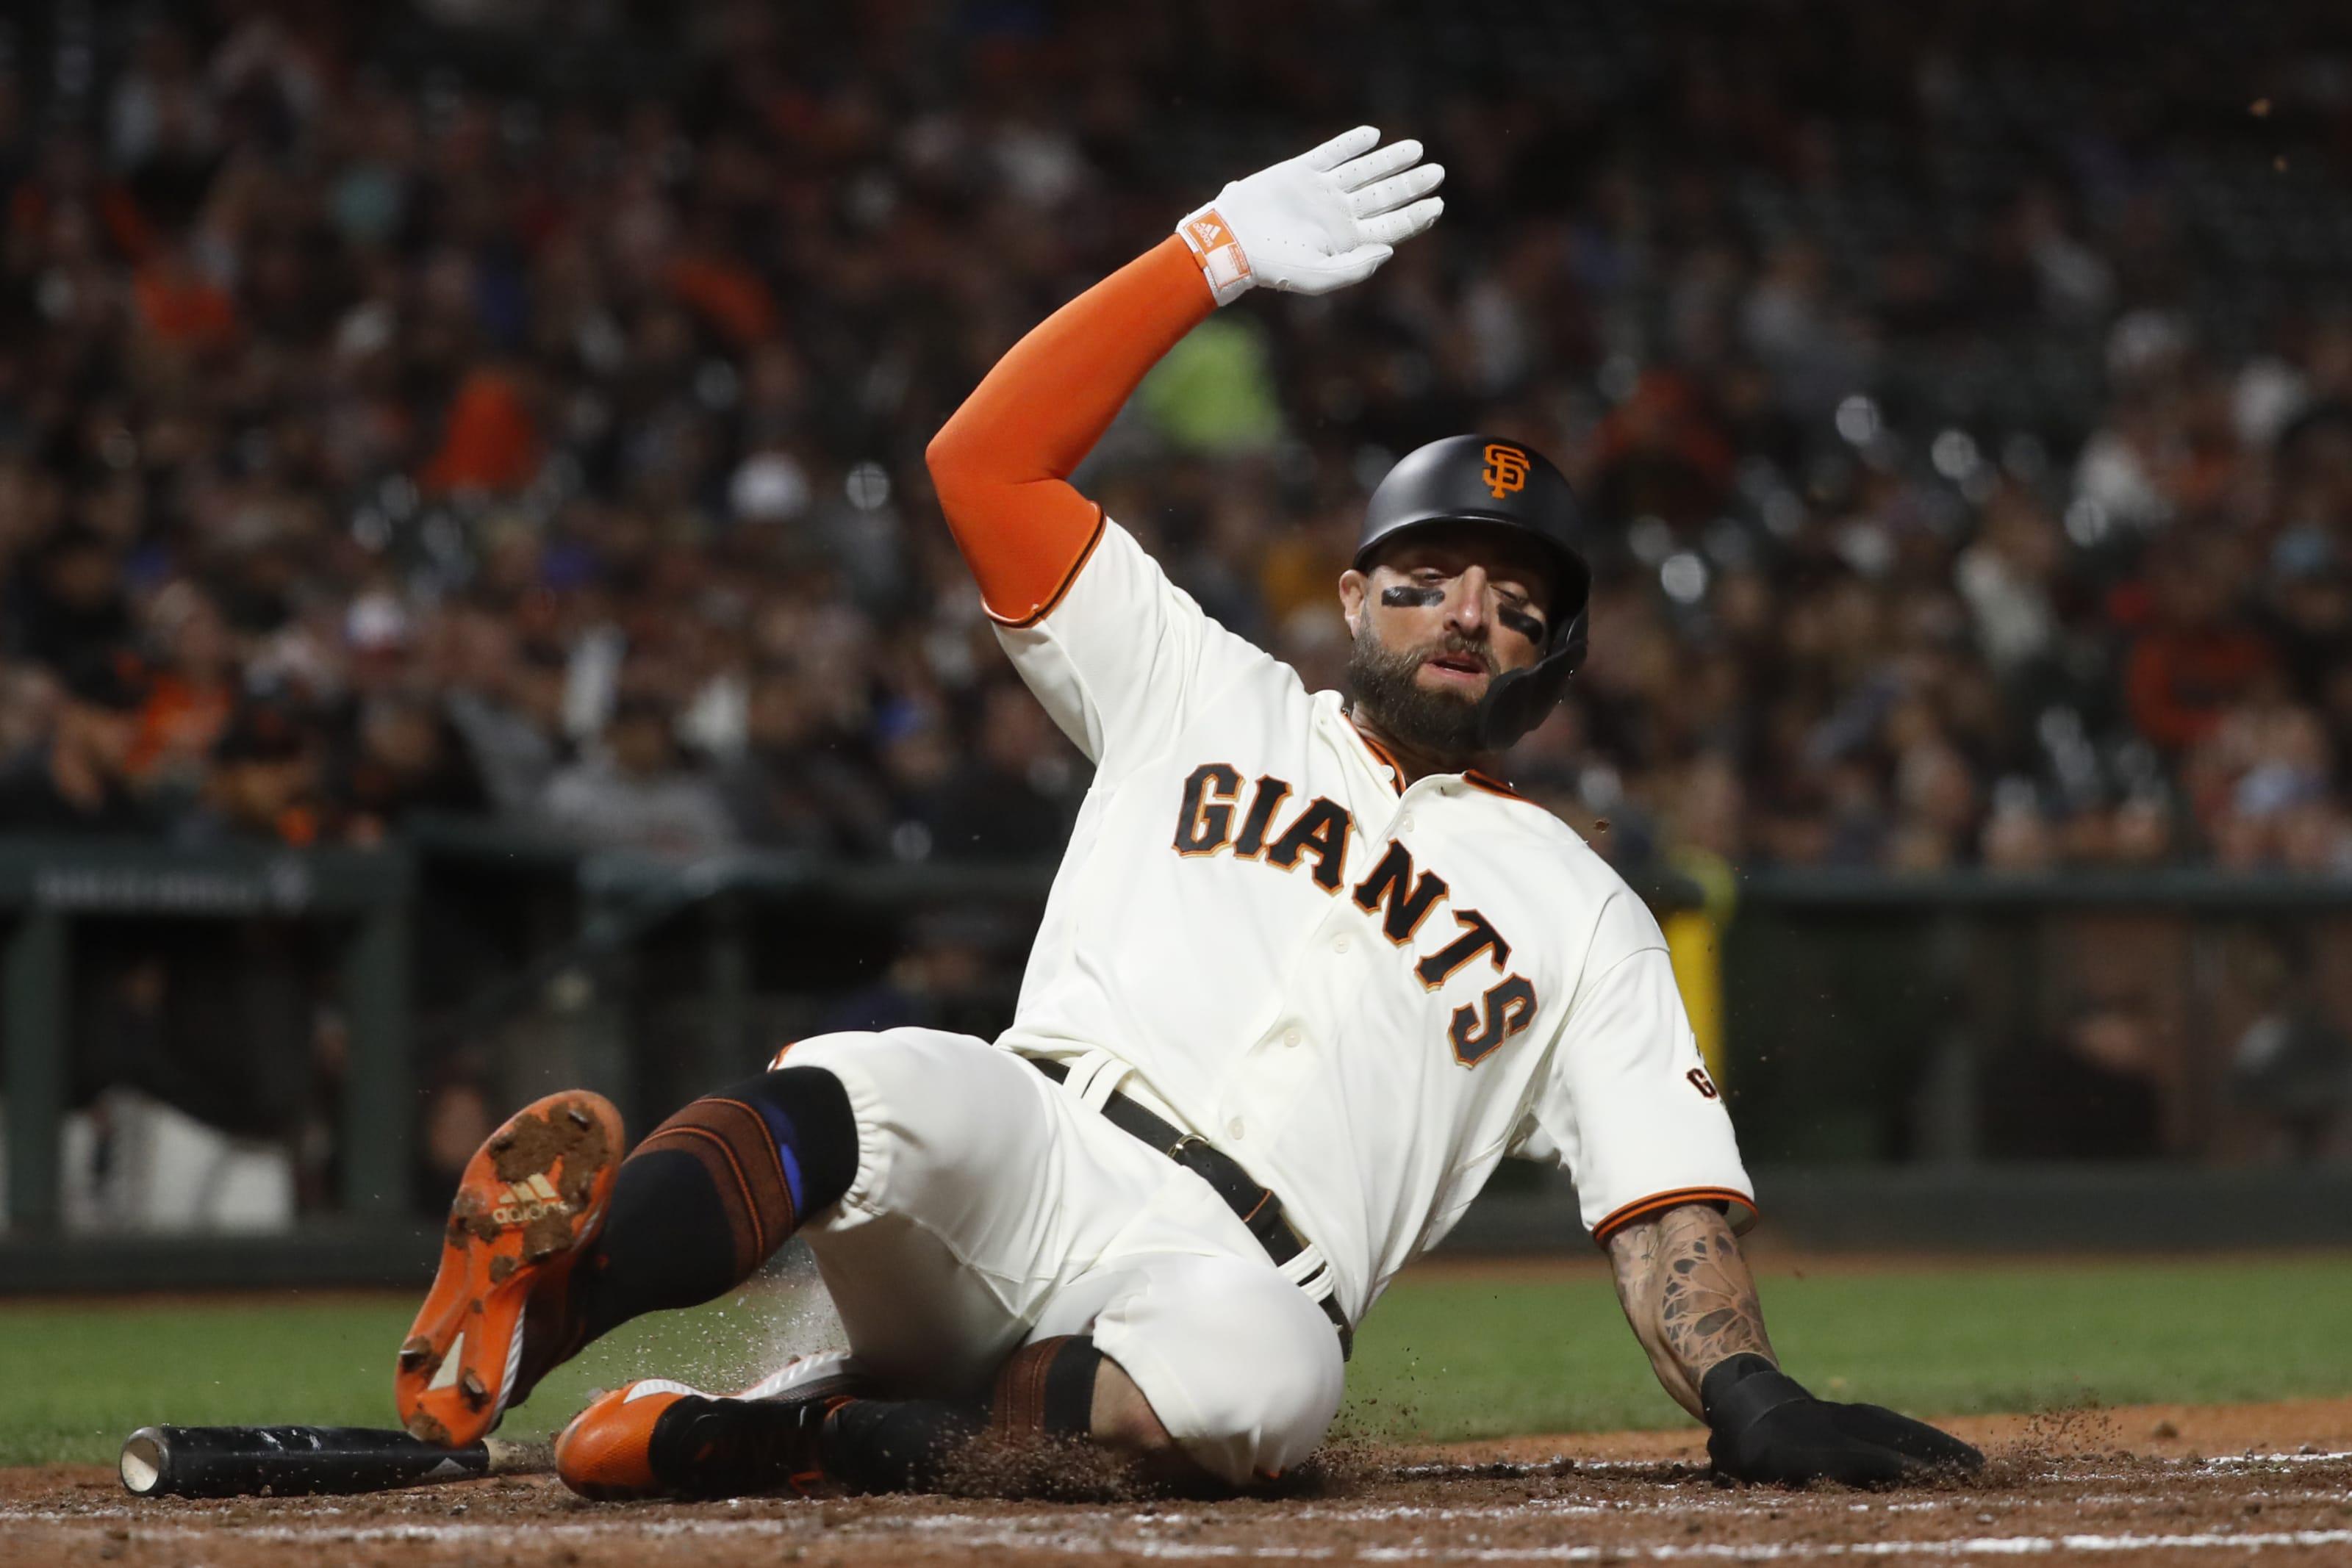 San Francisco Giants, Kevin Pillar